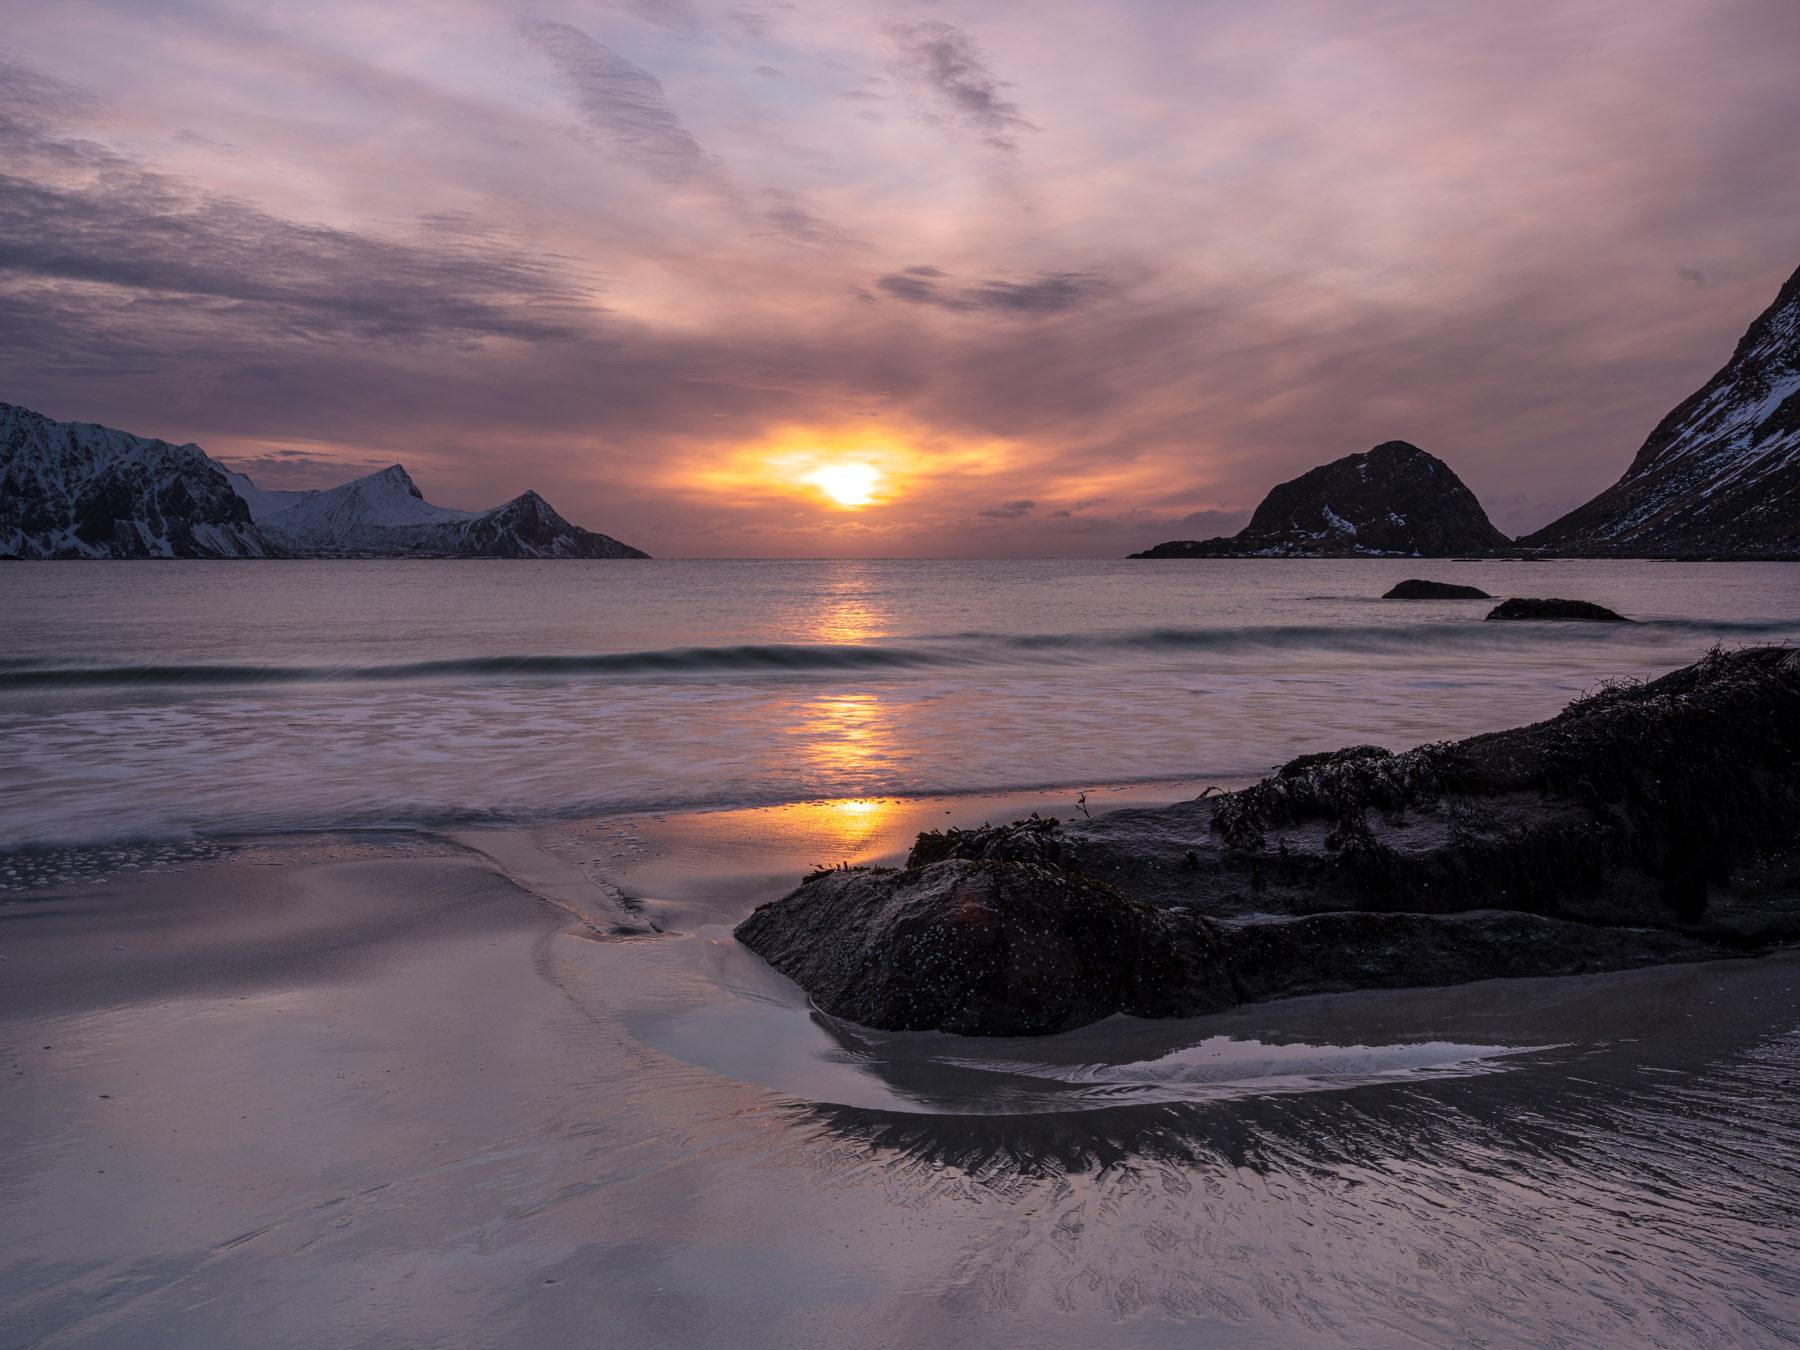 Sonnenuntergang in Haukland